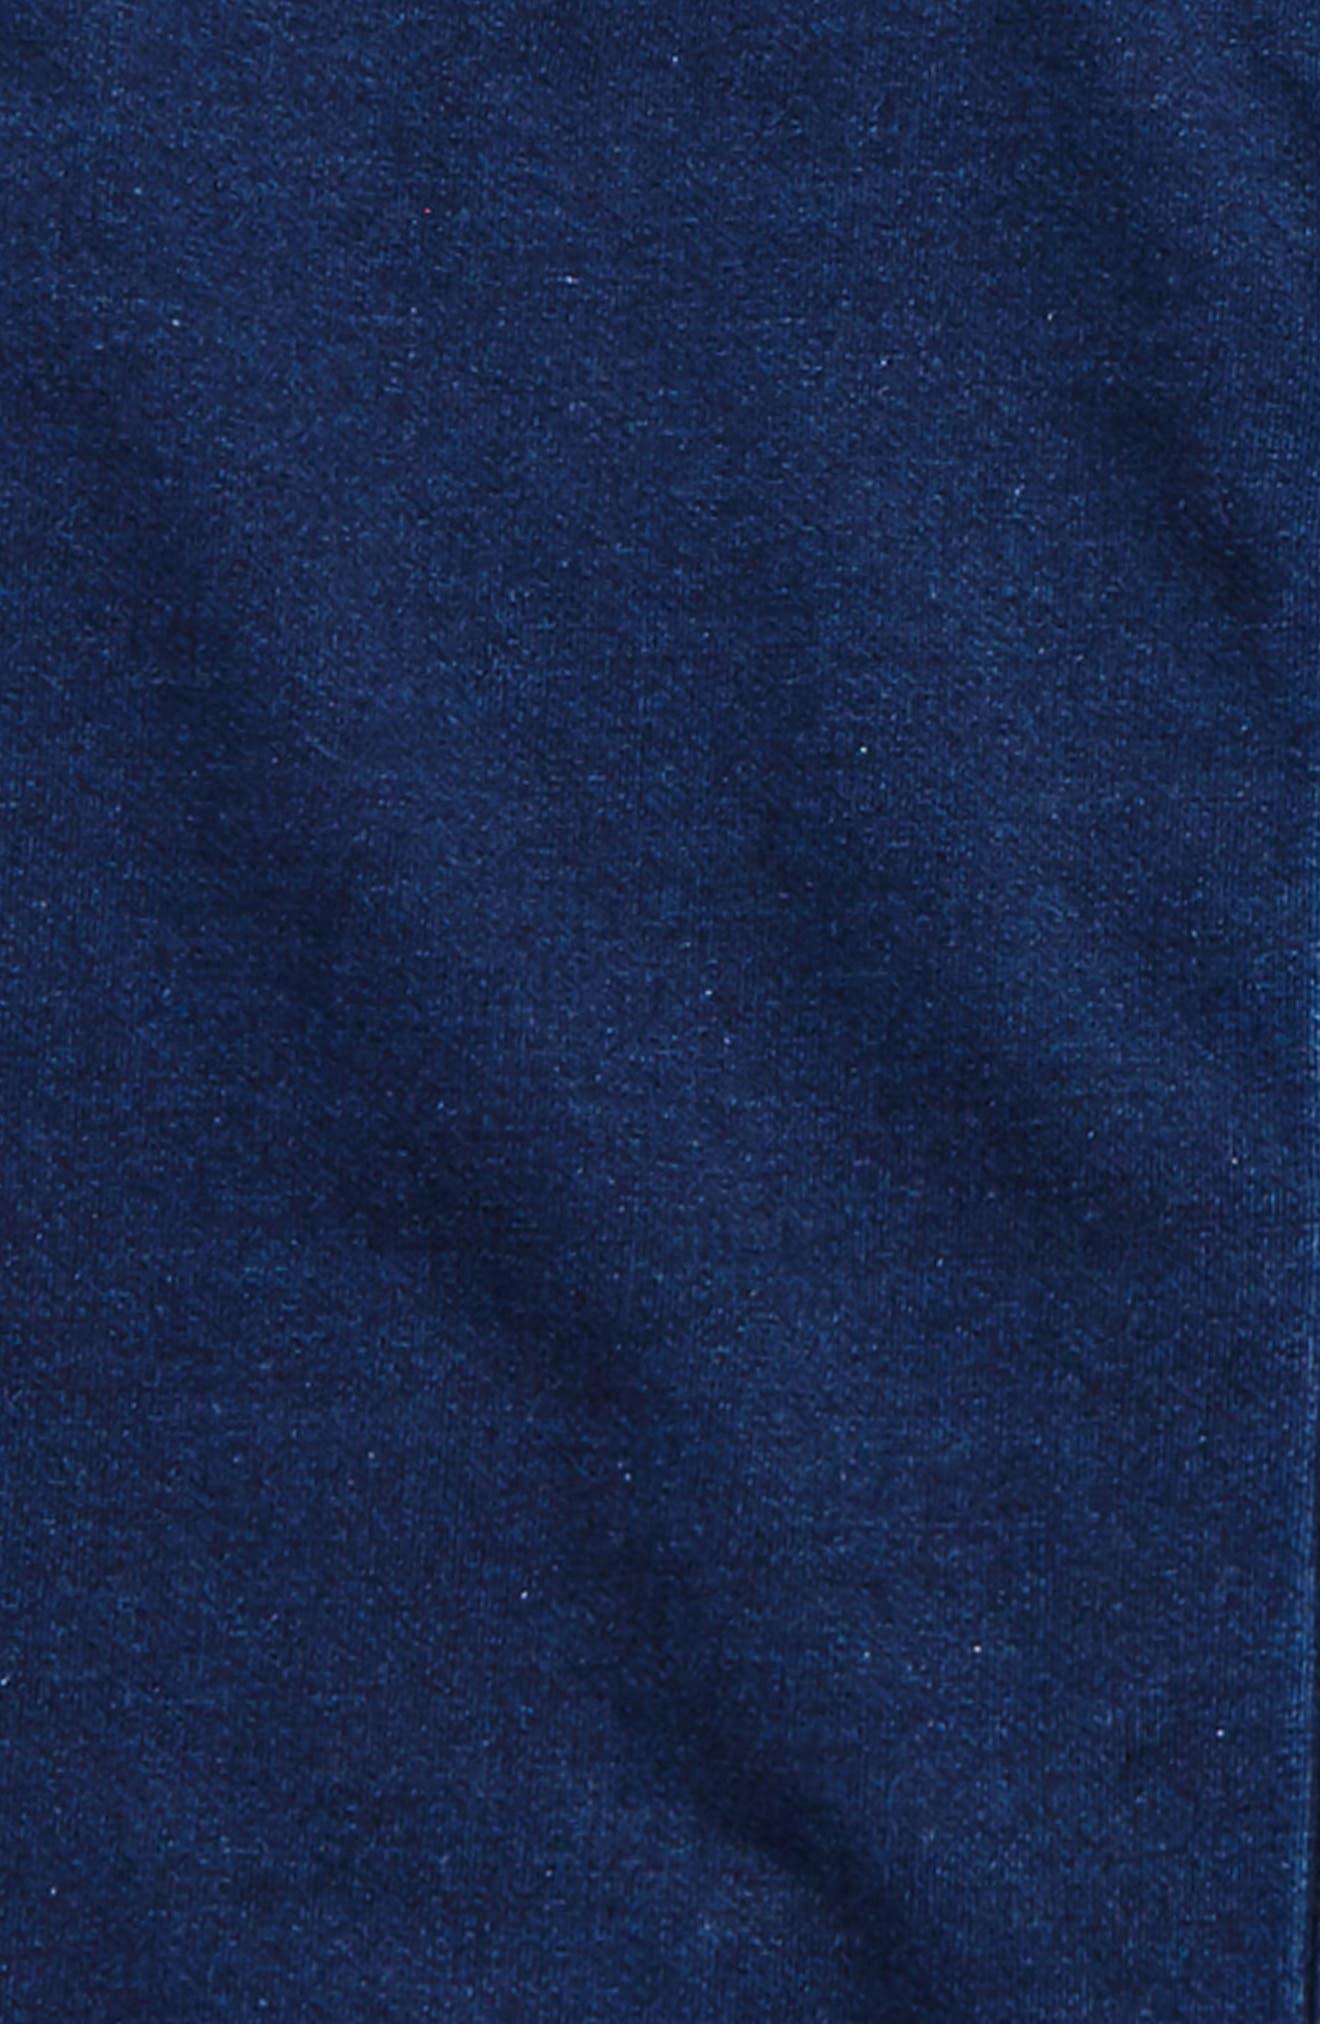 AG Jersey Fleece Bomber Jacket,                             Alternate thumbnail 2, color,                             Indigo